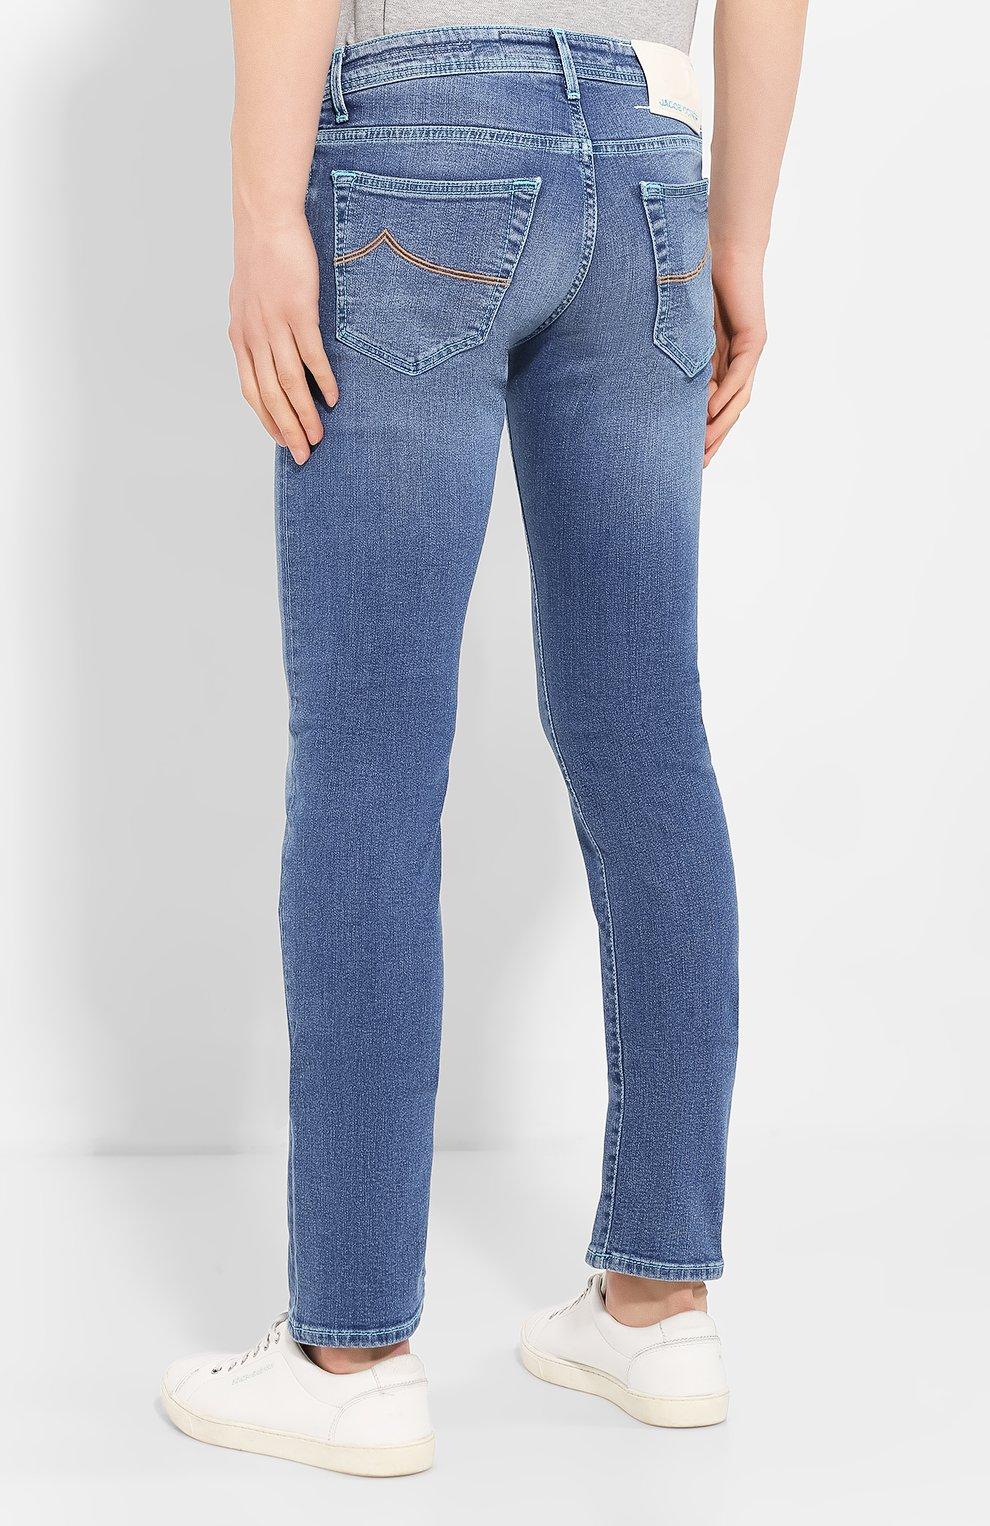 Мужские джинсы JACOB COHEN голубого цвета, арт. J622 C0MF 01850-W3/53   Фото 4